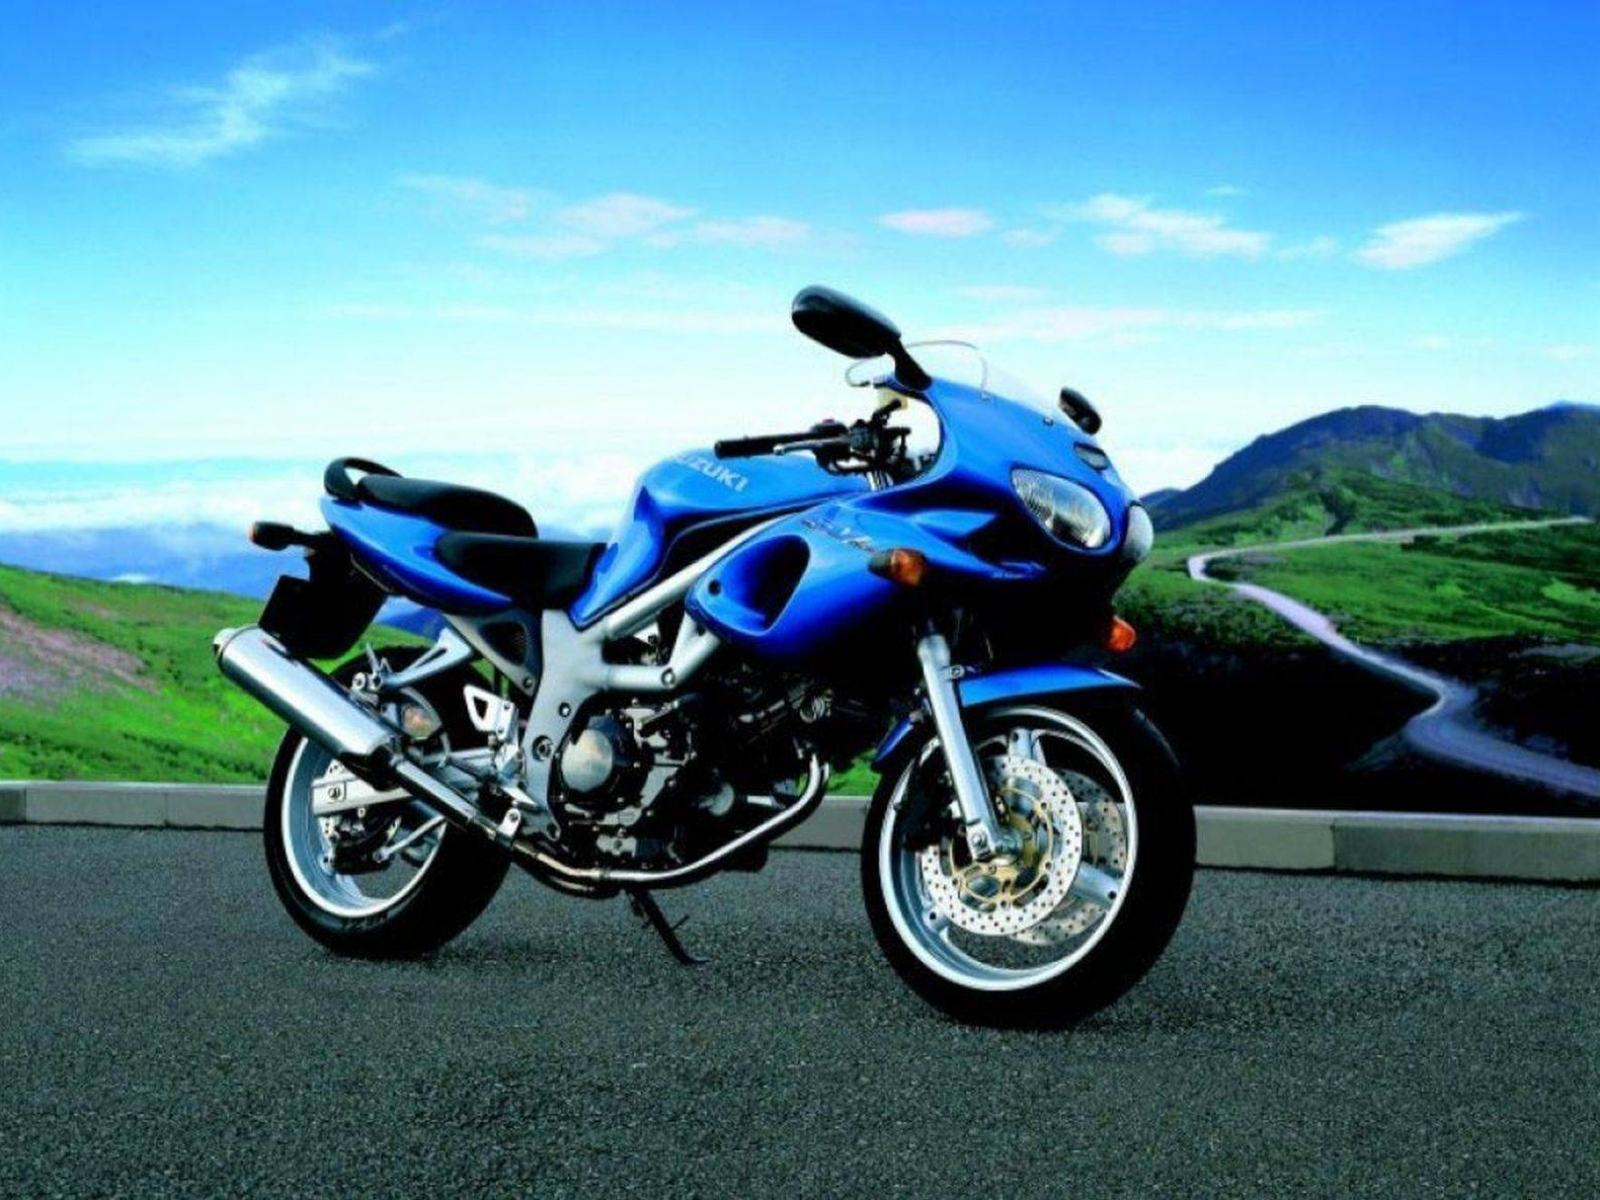 Фото гончих мотоциклов.